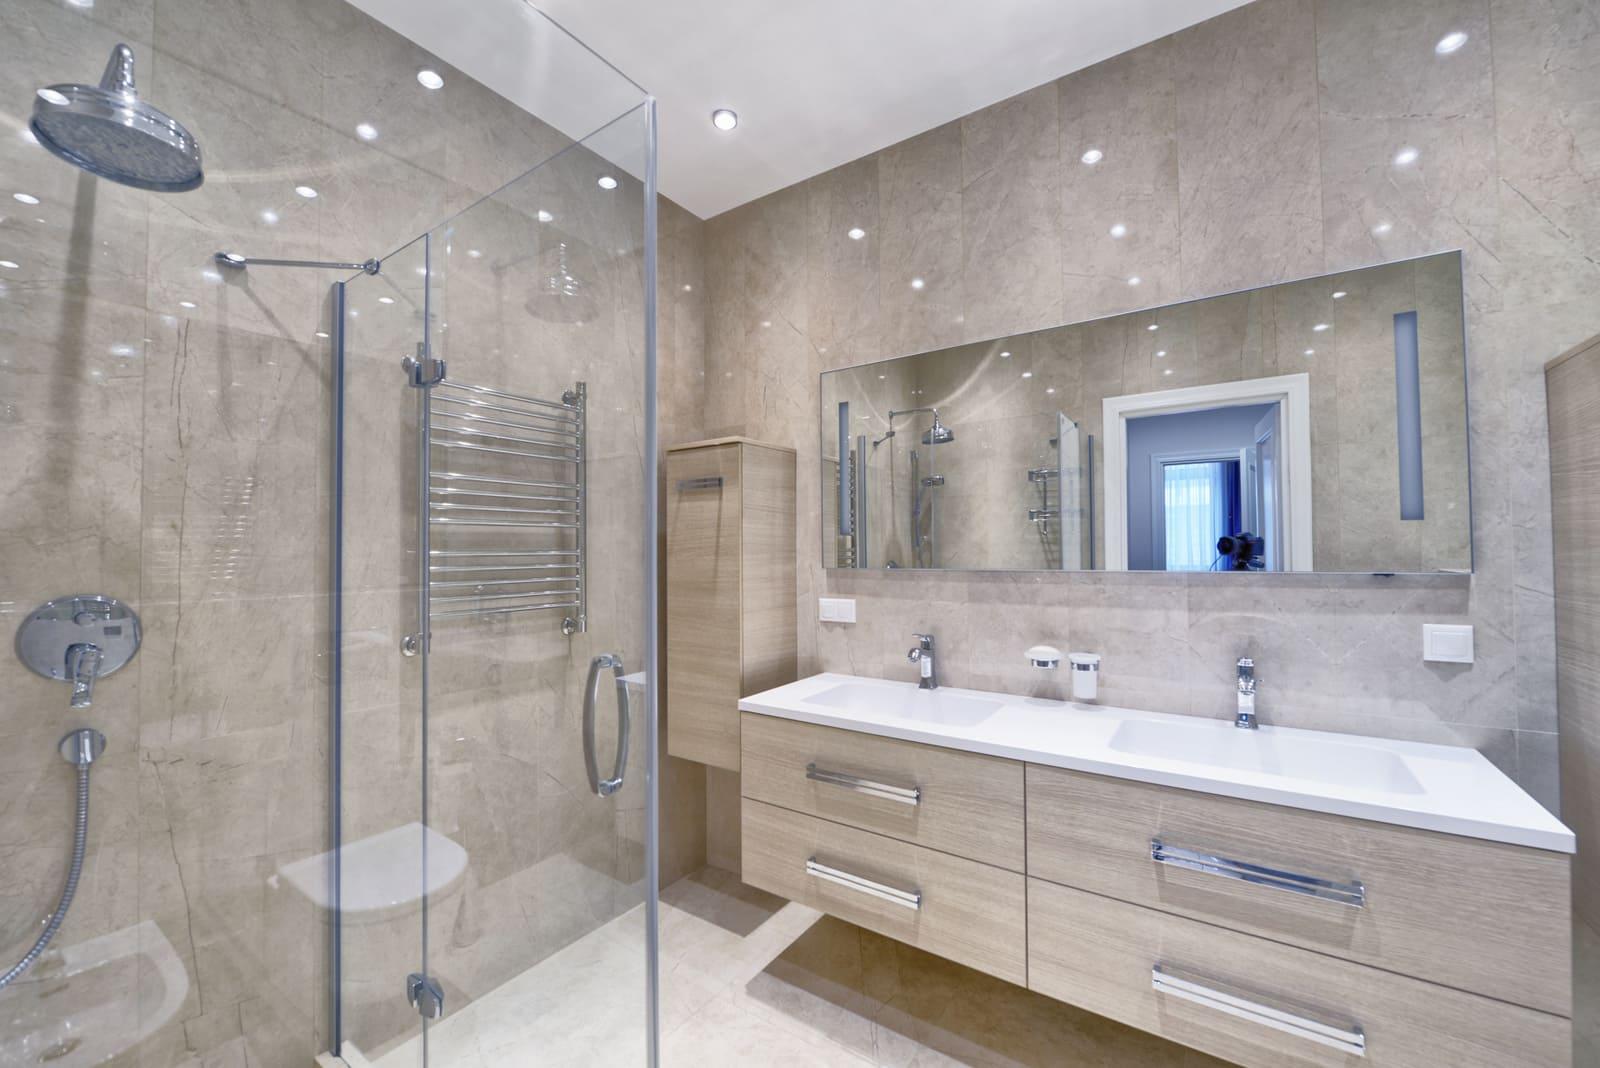 Sanitari e mobili per bagno torino new energy idro termo for Subito mobili torino